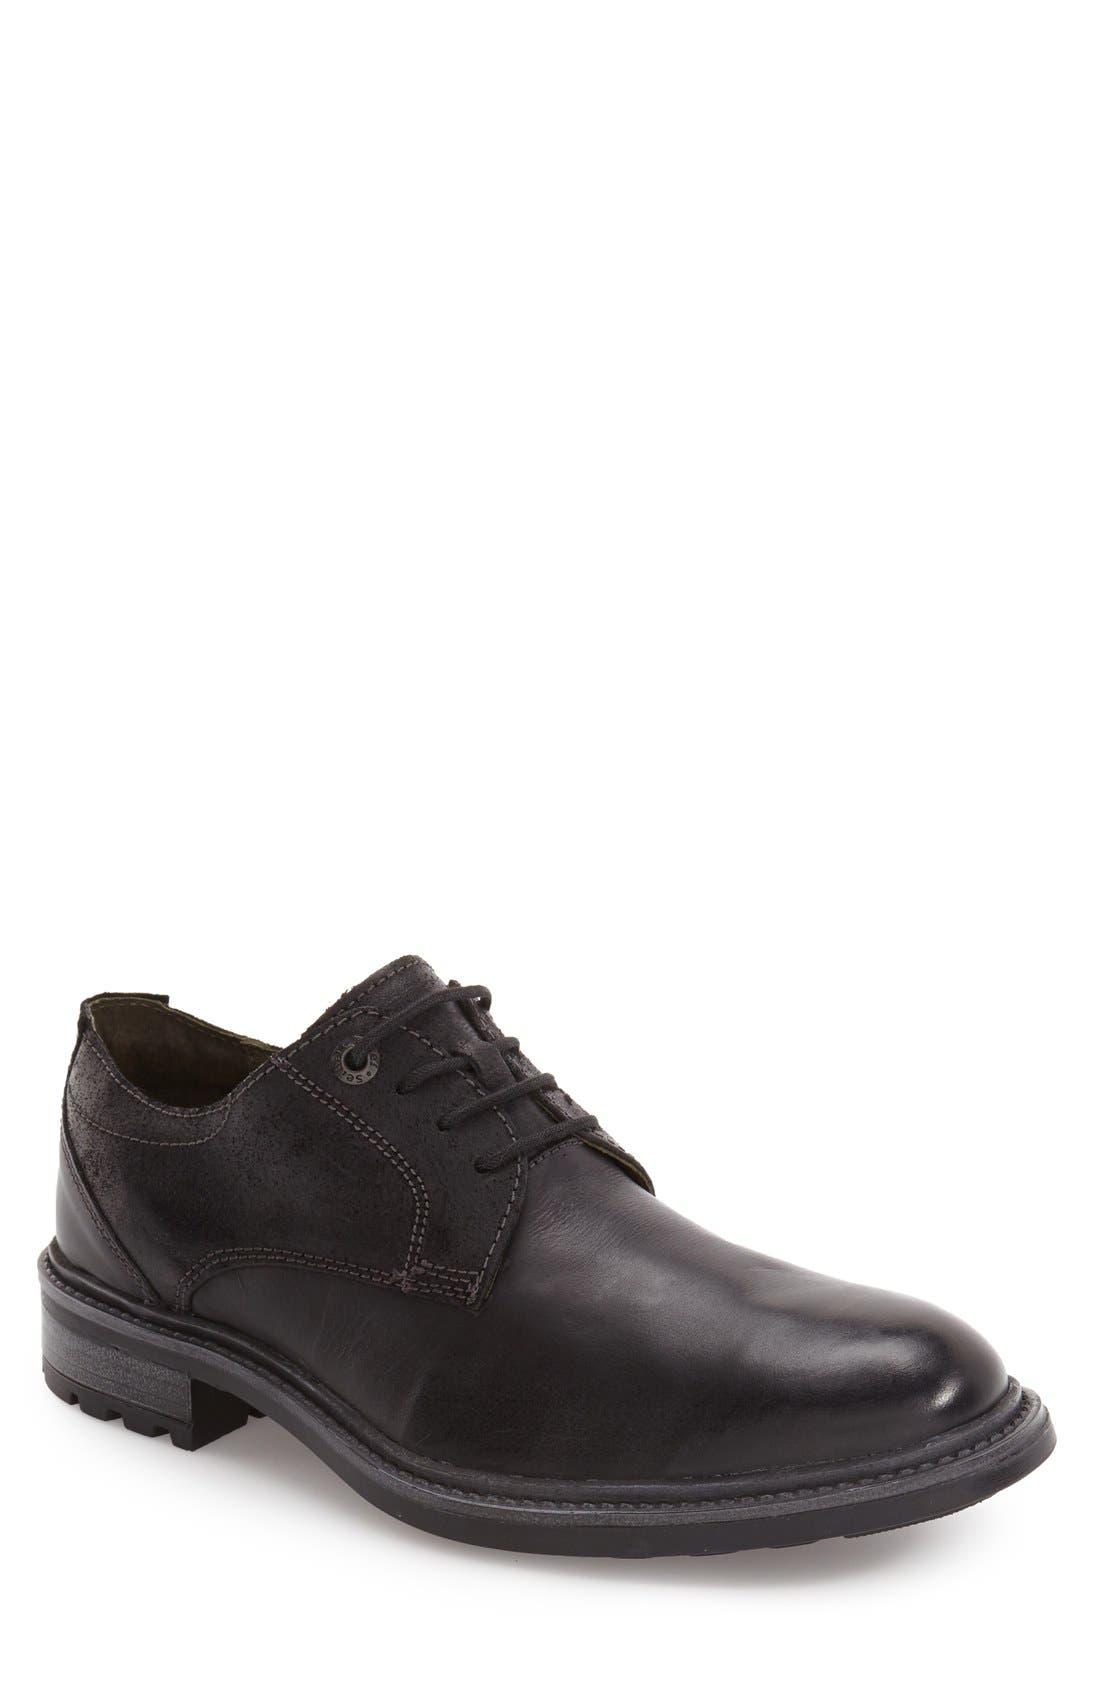 Oscar Plain Toe Derby,                             Main thumbnail 1, color,                             Black Leather